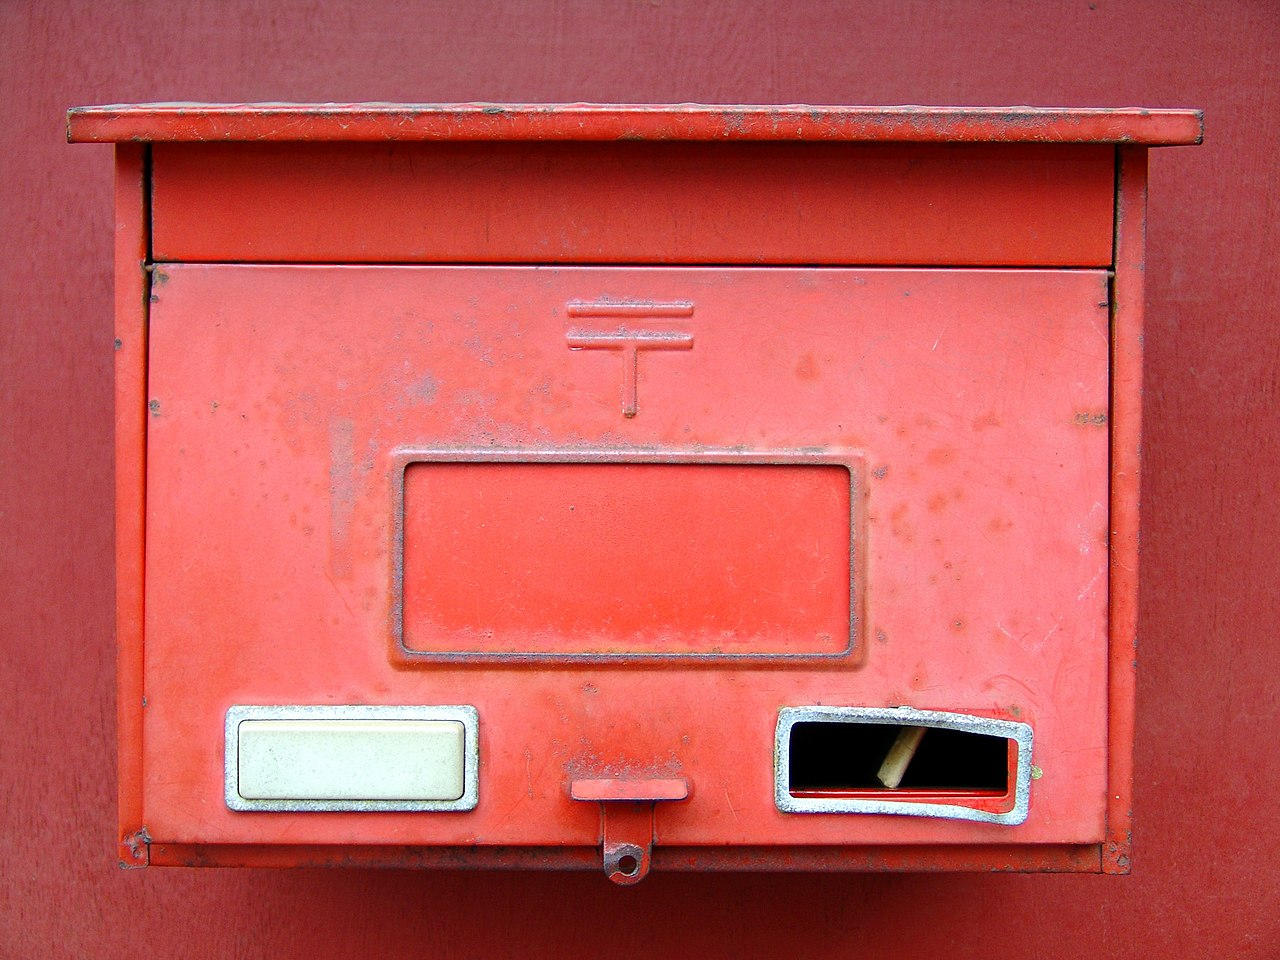 File:Red Mailbox Red Door.jpg - Wikimedia Commons